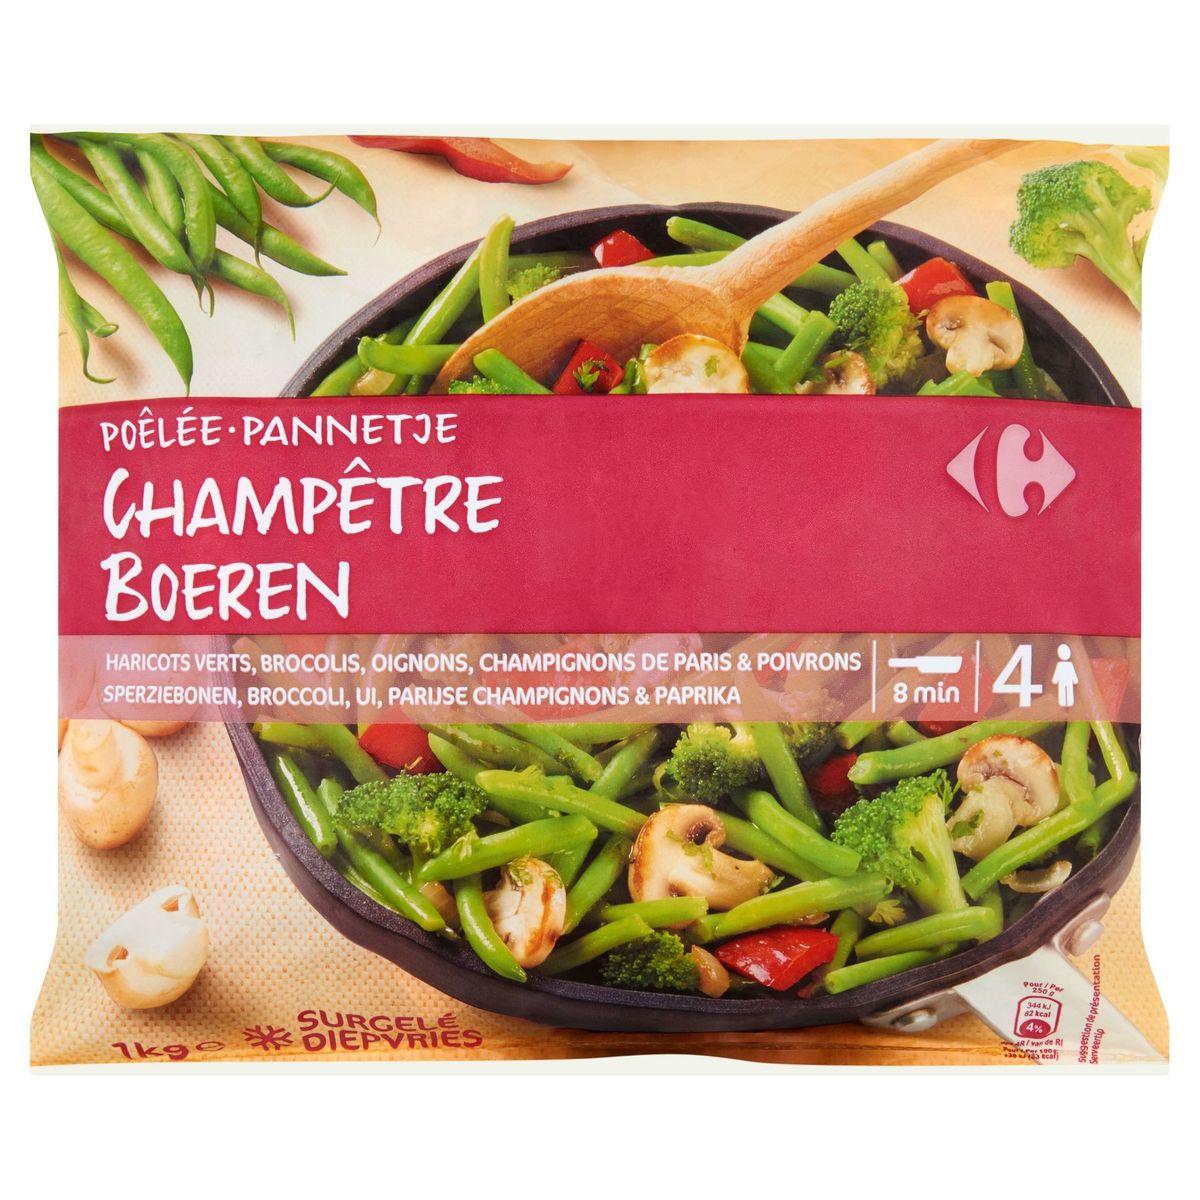 Carrefour Sperziebonen, Broccoli, Parijse Champignons & Paprika 1 kg